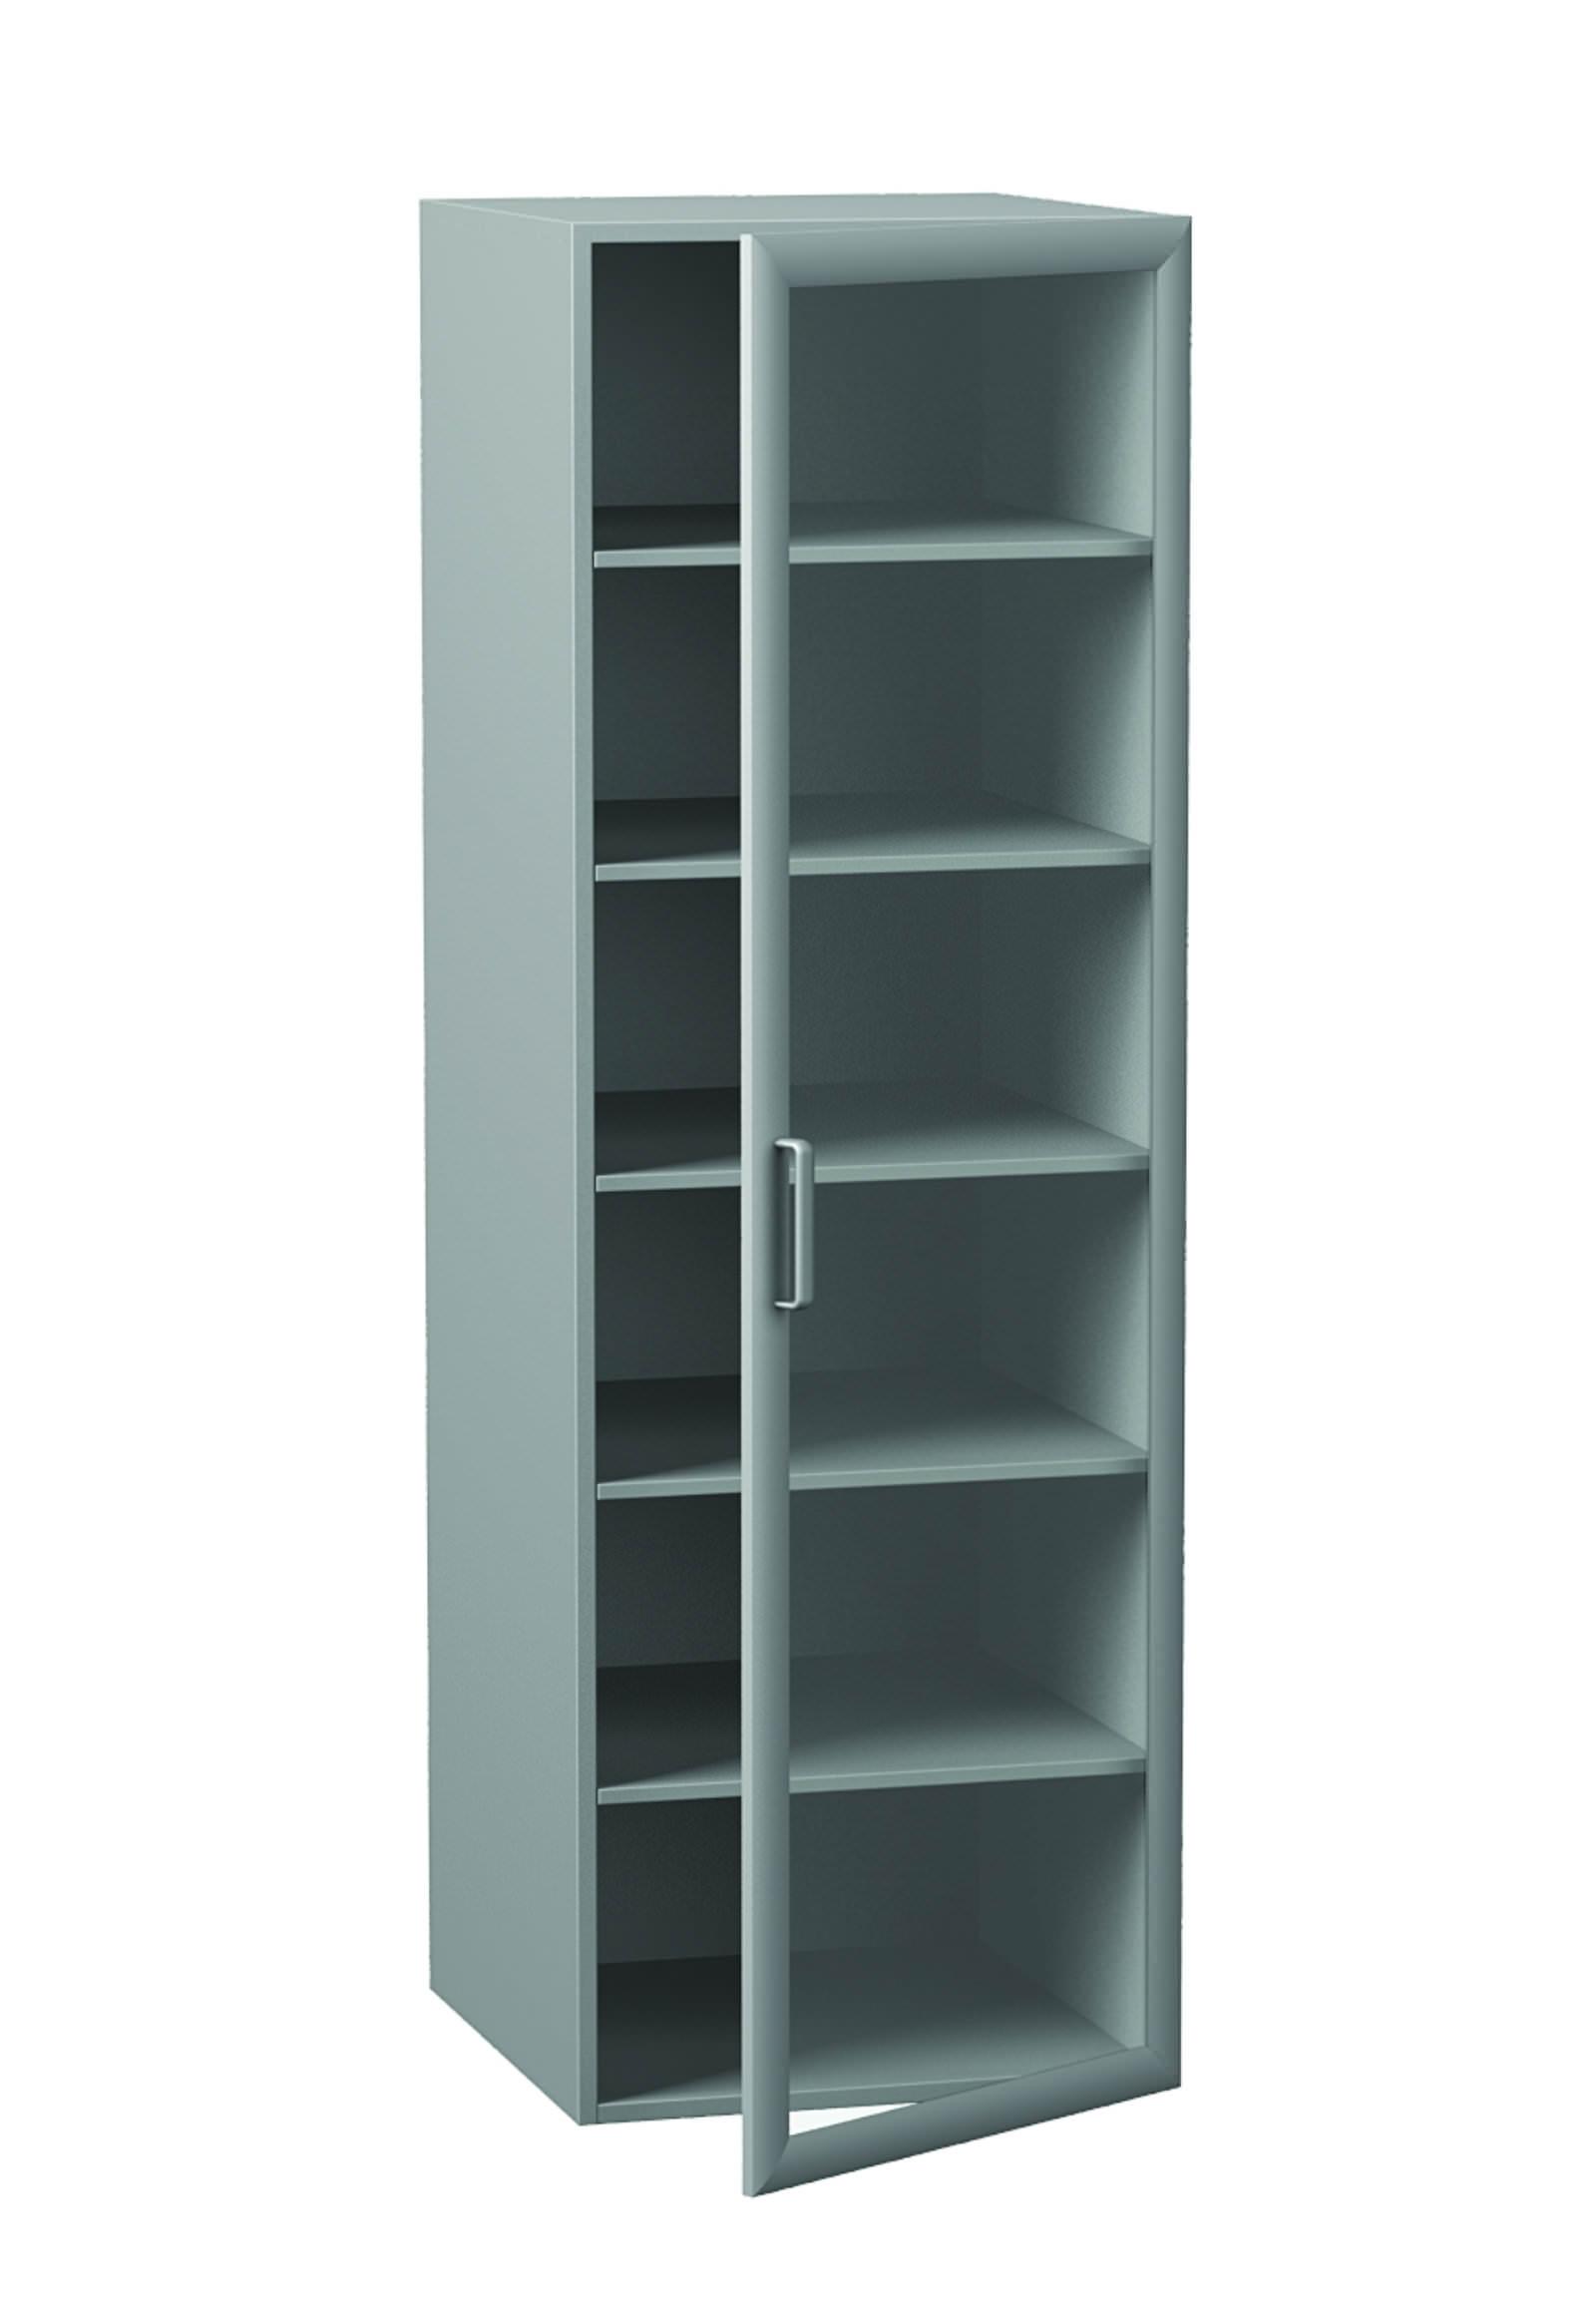 Медицинский шкаф ДМ-4-001-09